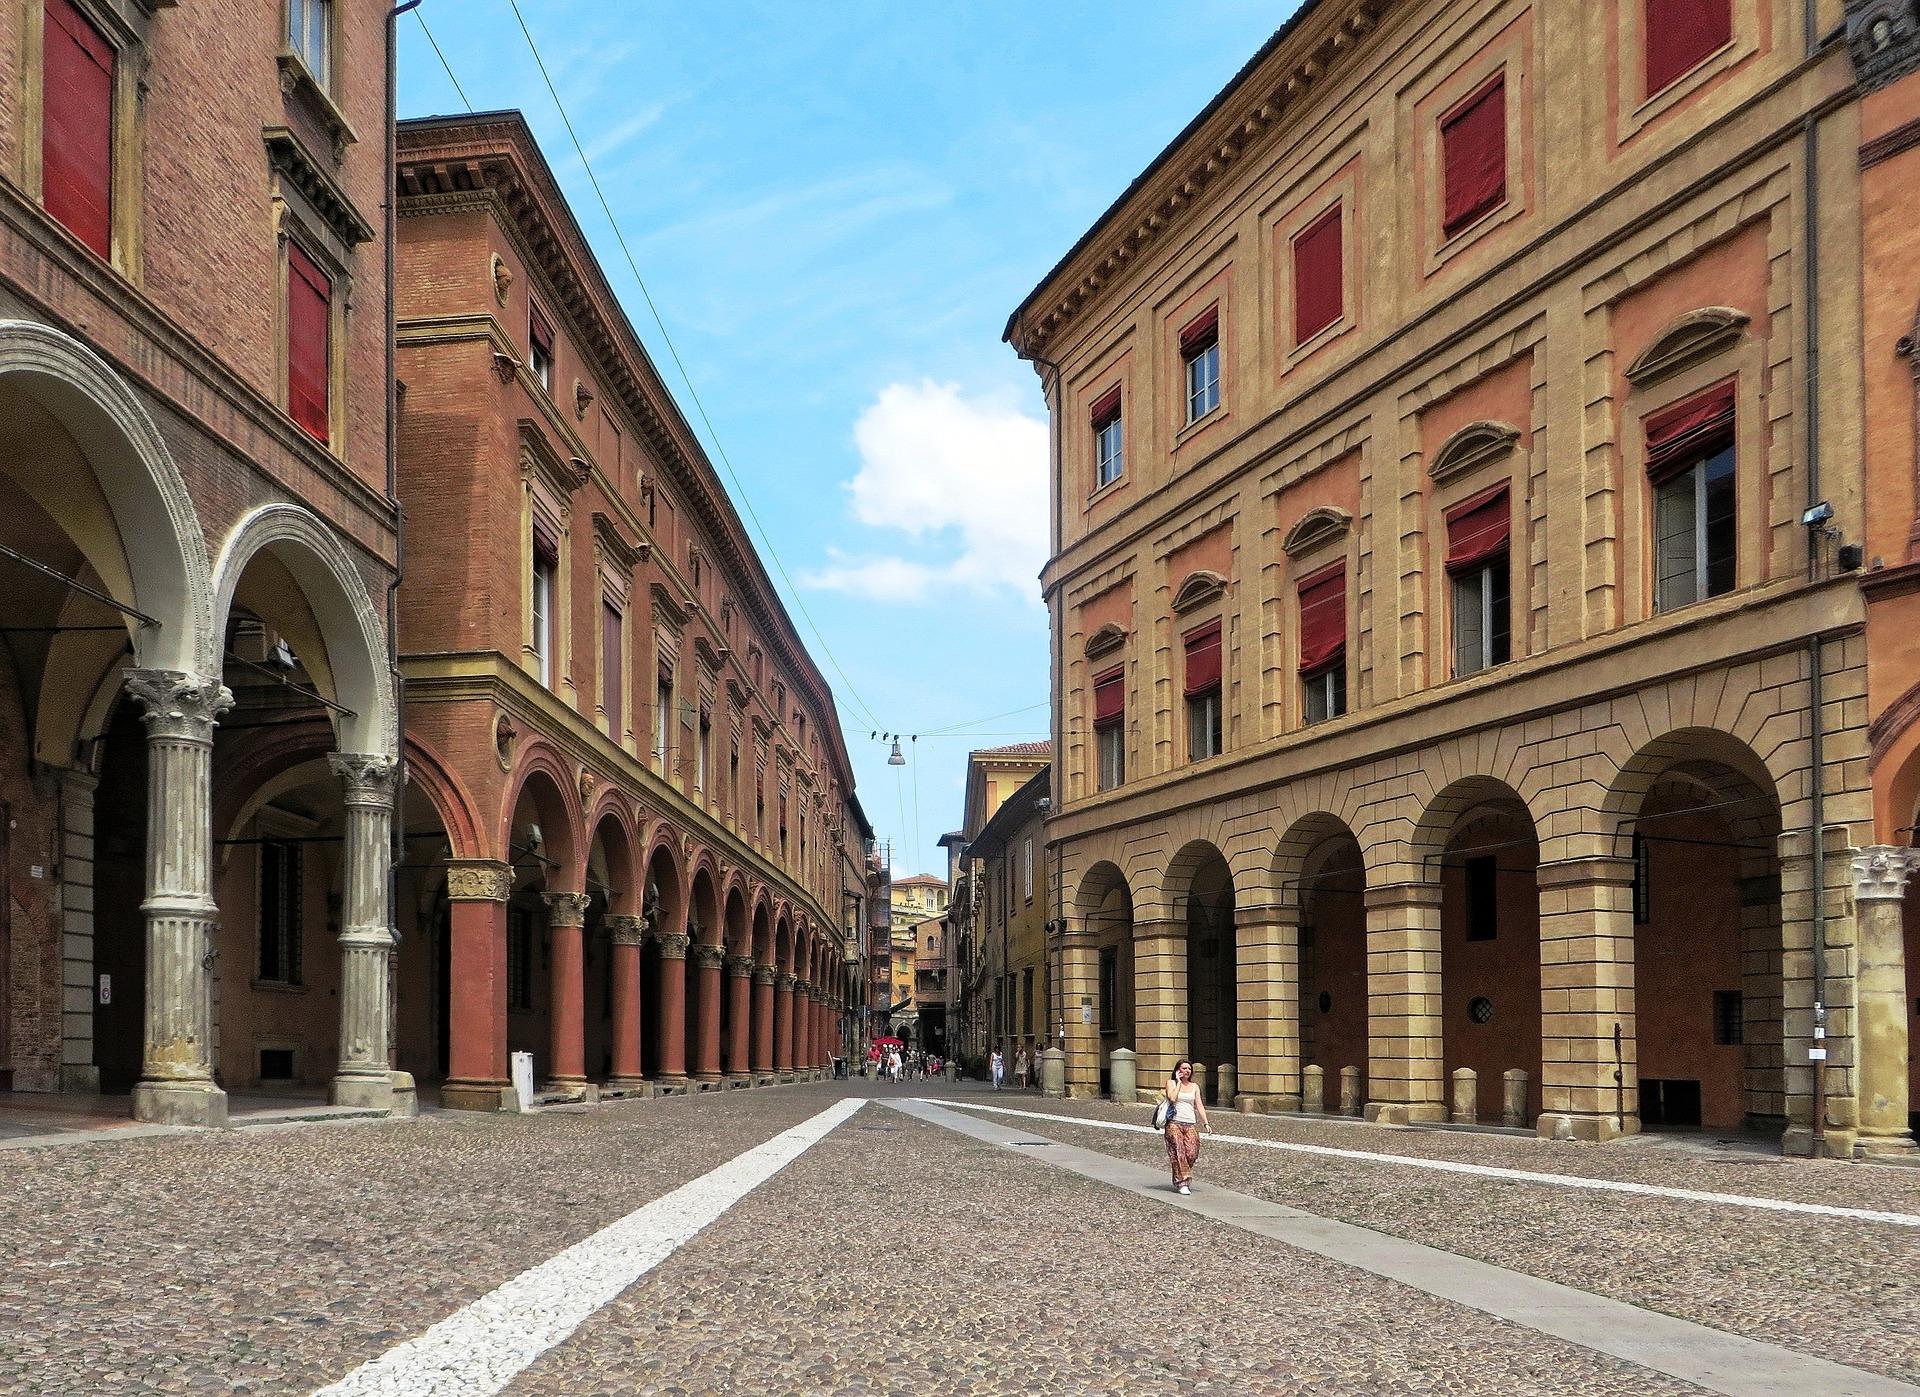 Bologna portici pixabay.jpg